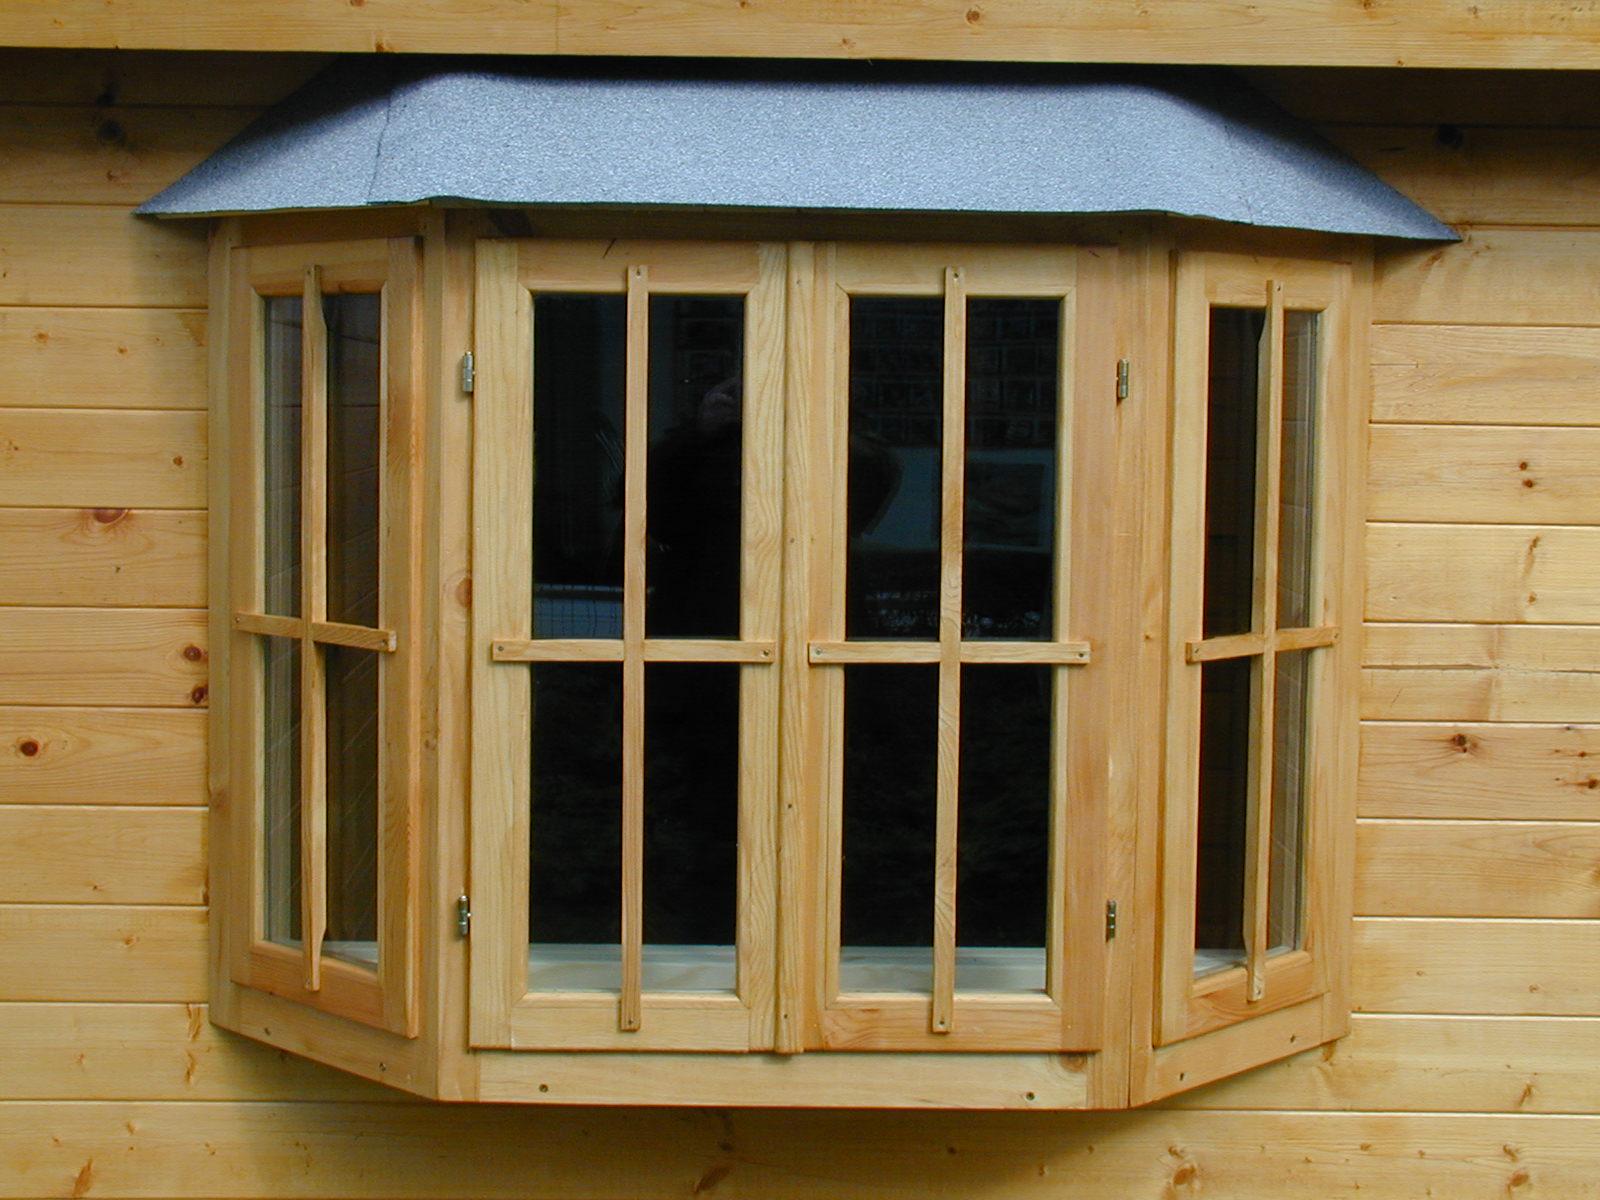 Wallpapers ventanas for Modelos de puerta de madera para casa